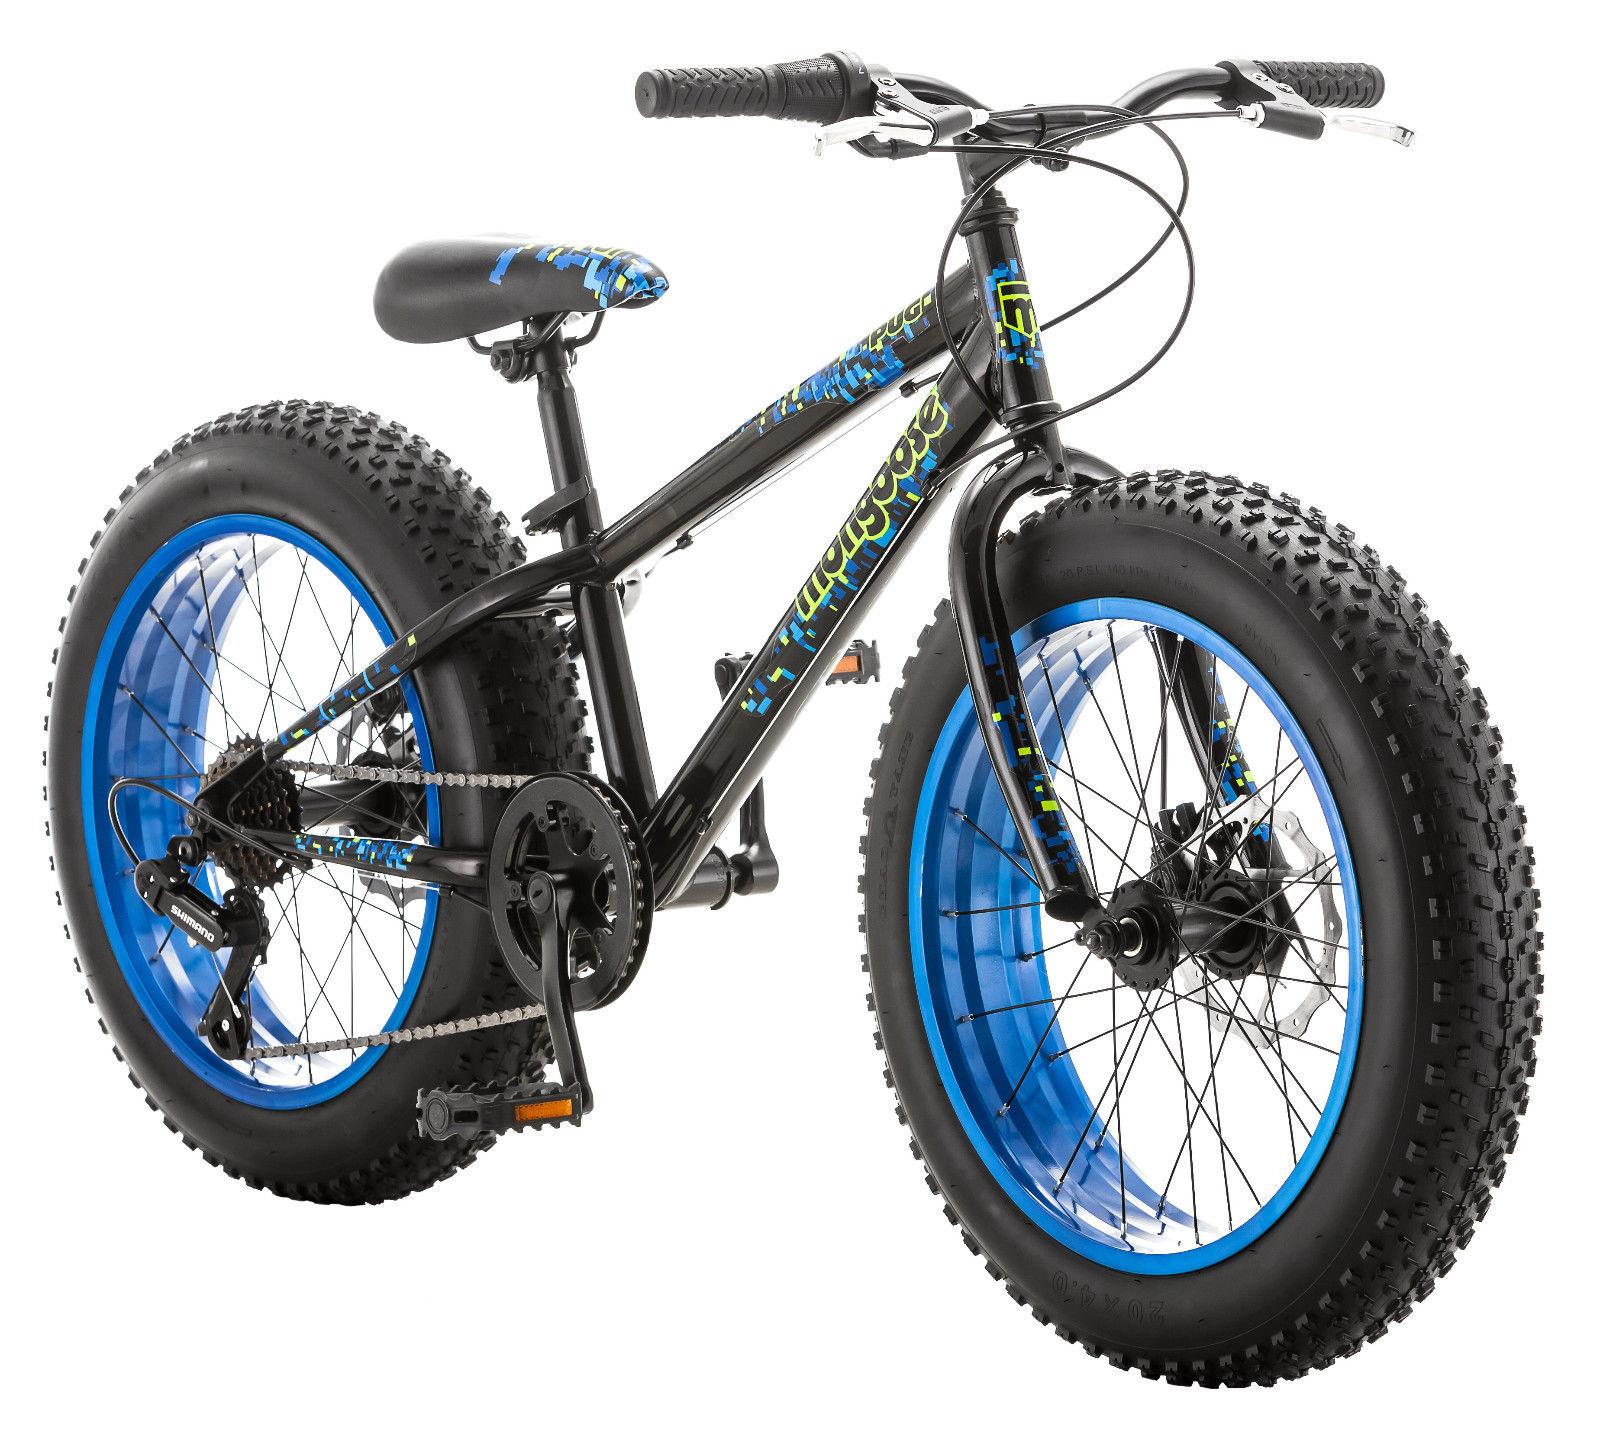 "20"" Mongoose Pug Fat Tire Bike Disc Brakes, Black $115.19"